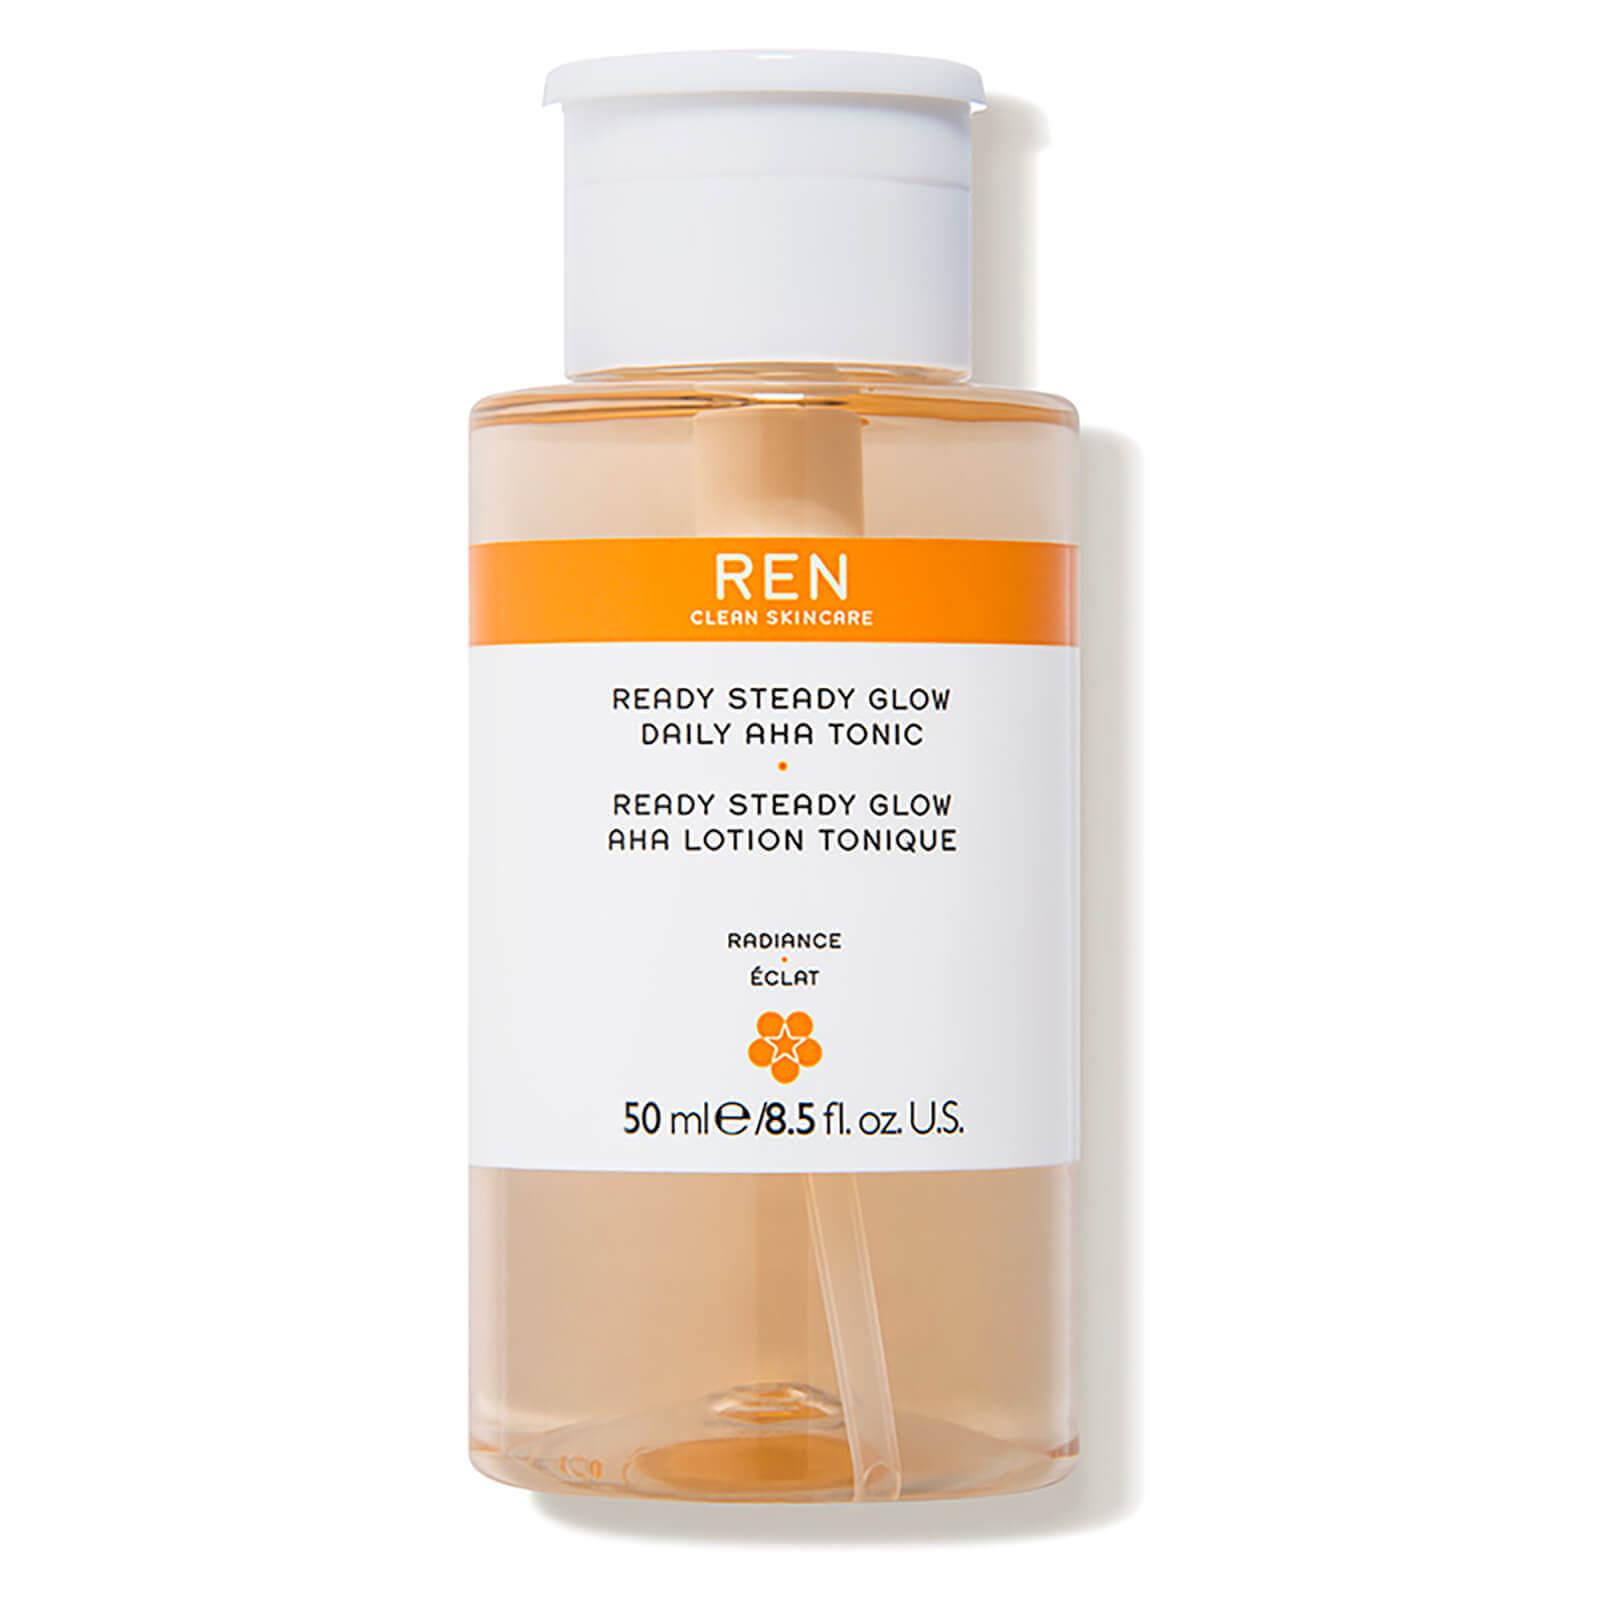 REN Ready Steady Glow Daily AHA Tonic 50ml